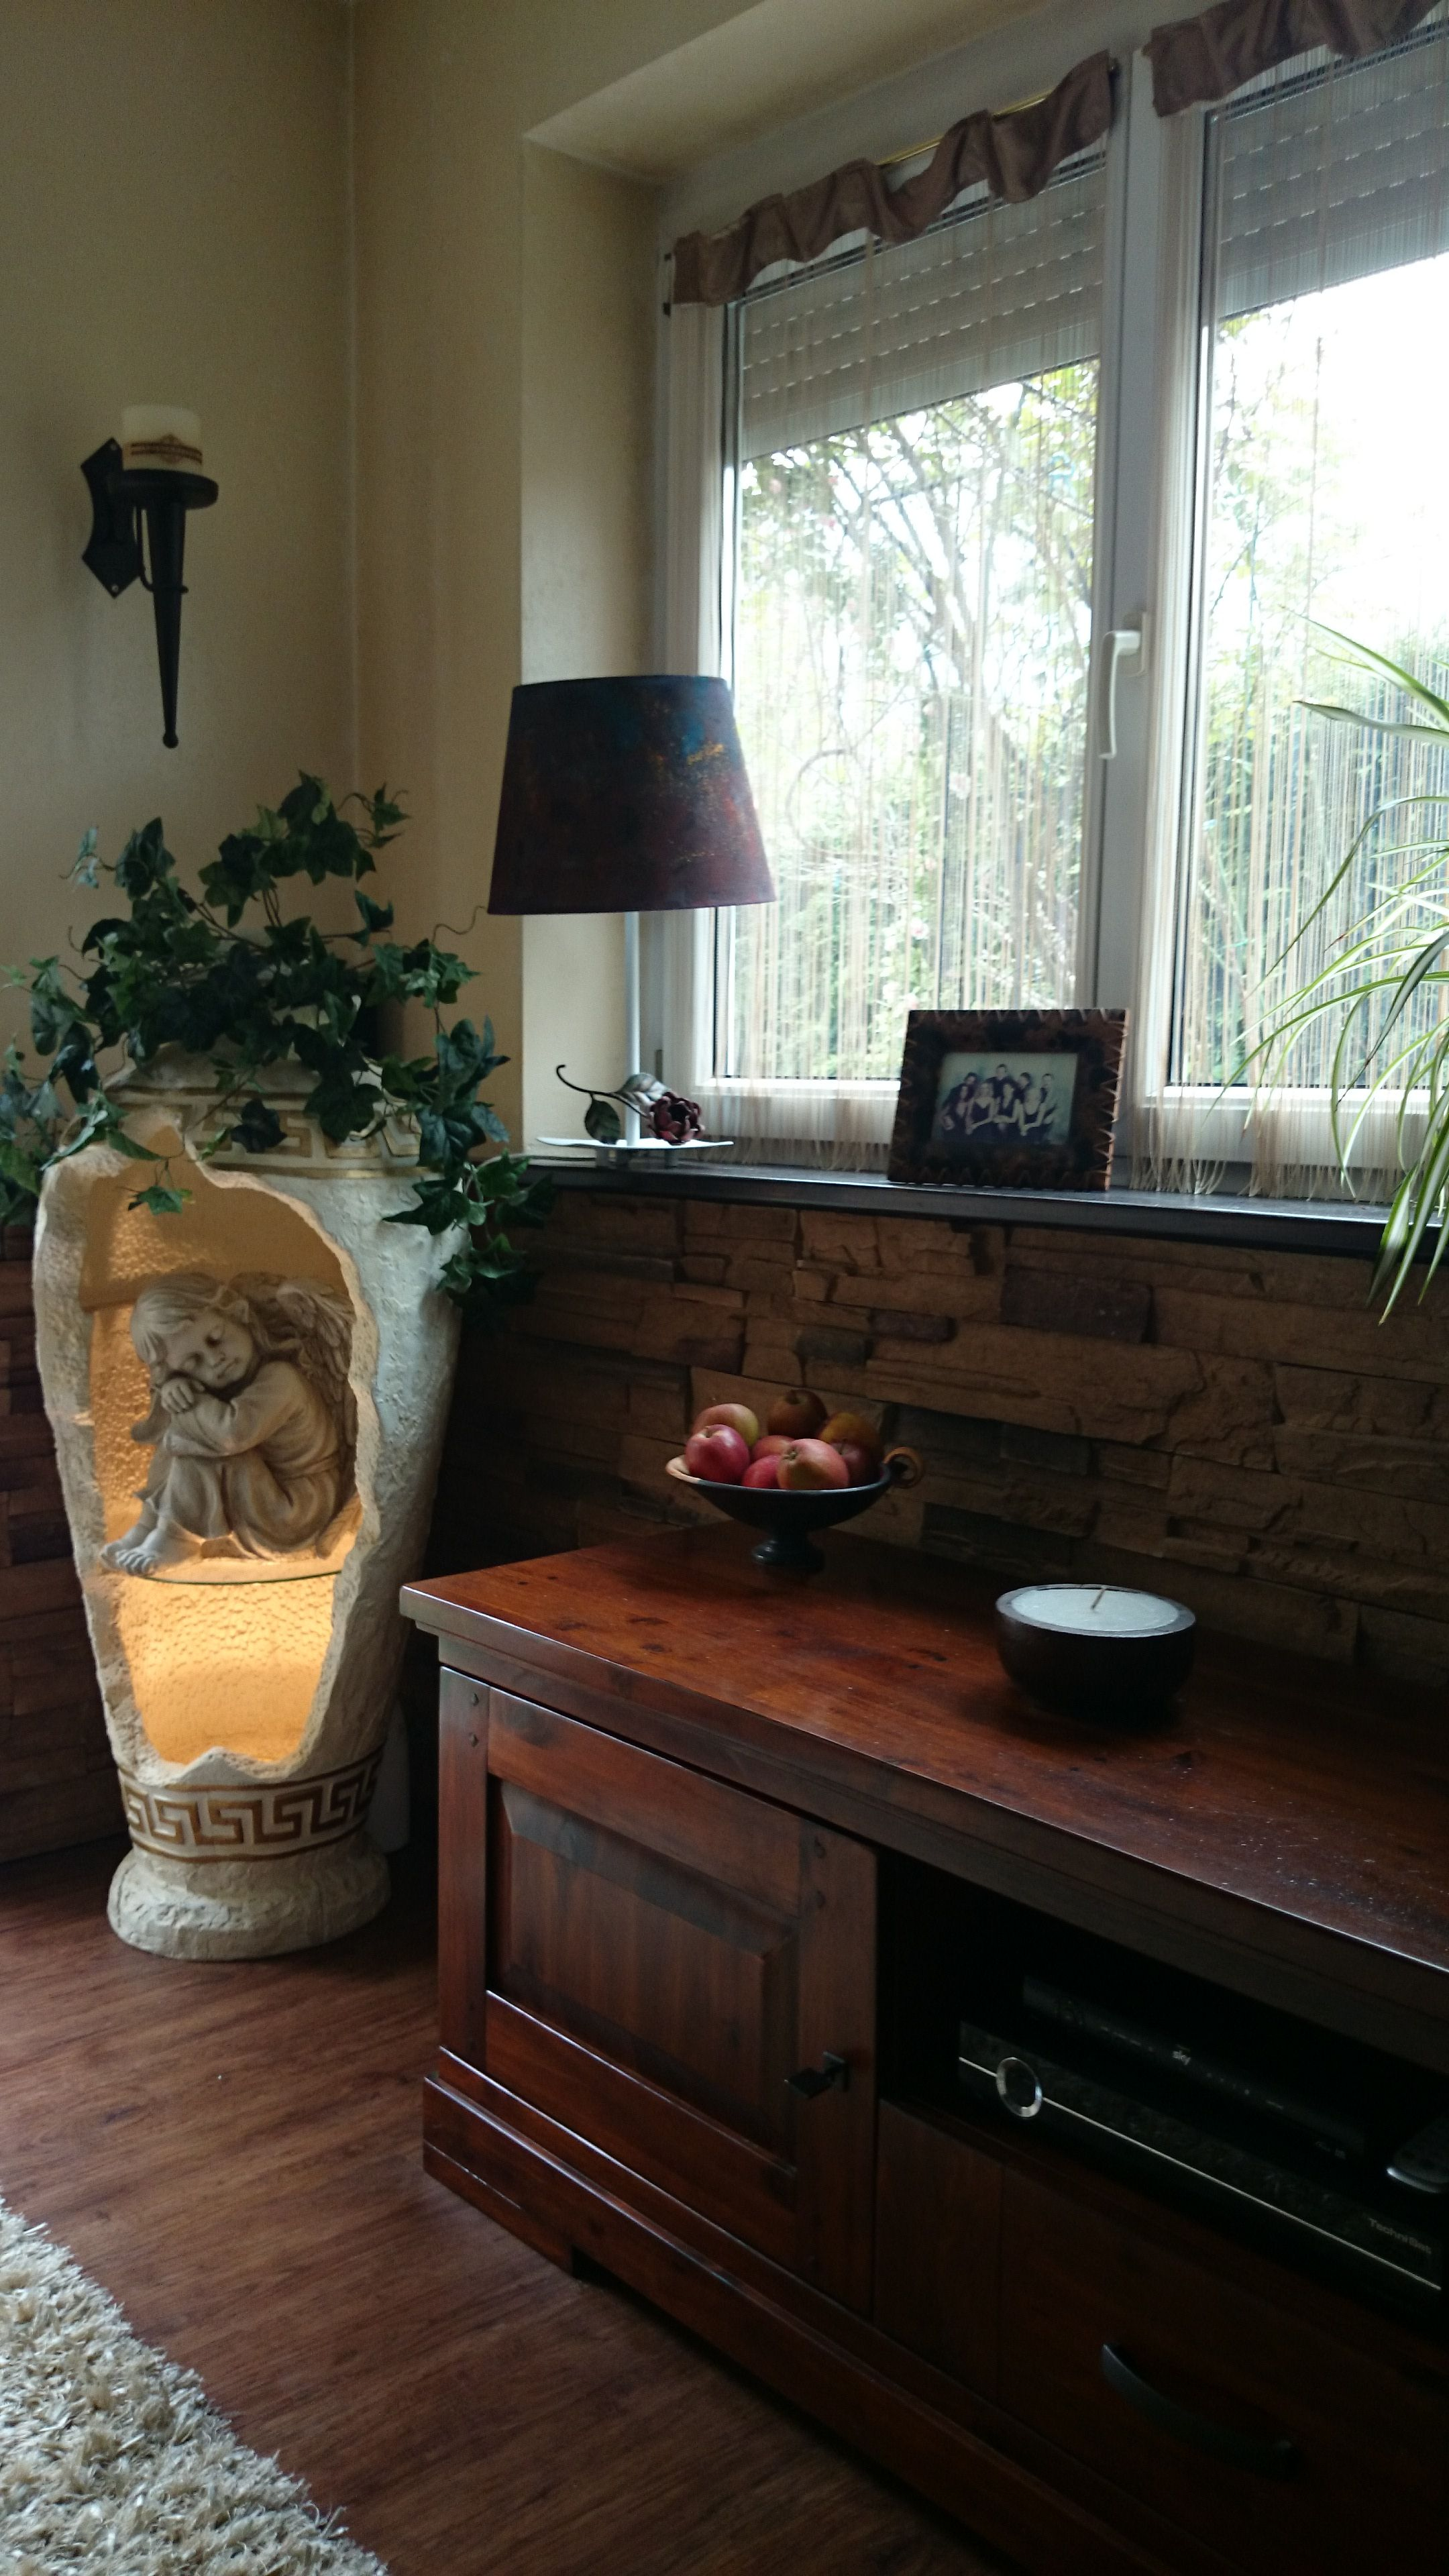 Landhausstile mit Lampe Dora Landhausstil mit Lampe Dora. Bei der ...